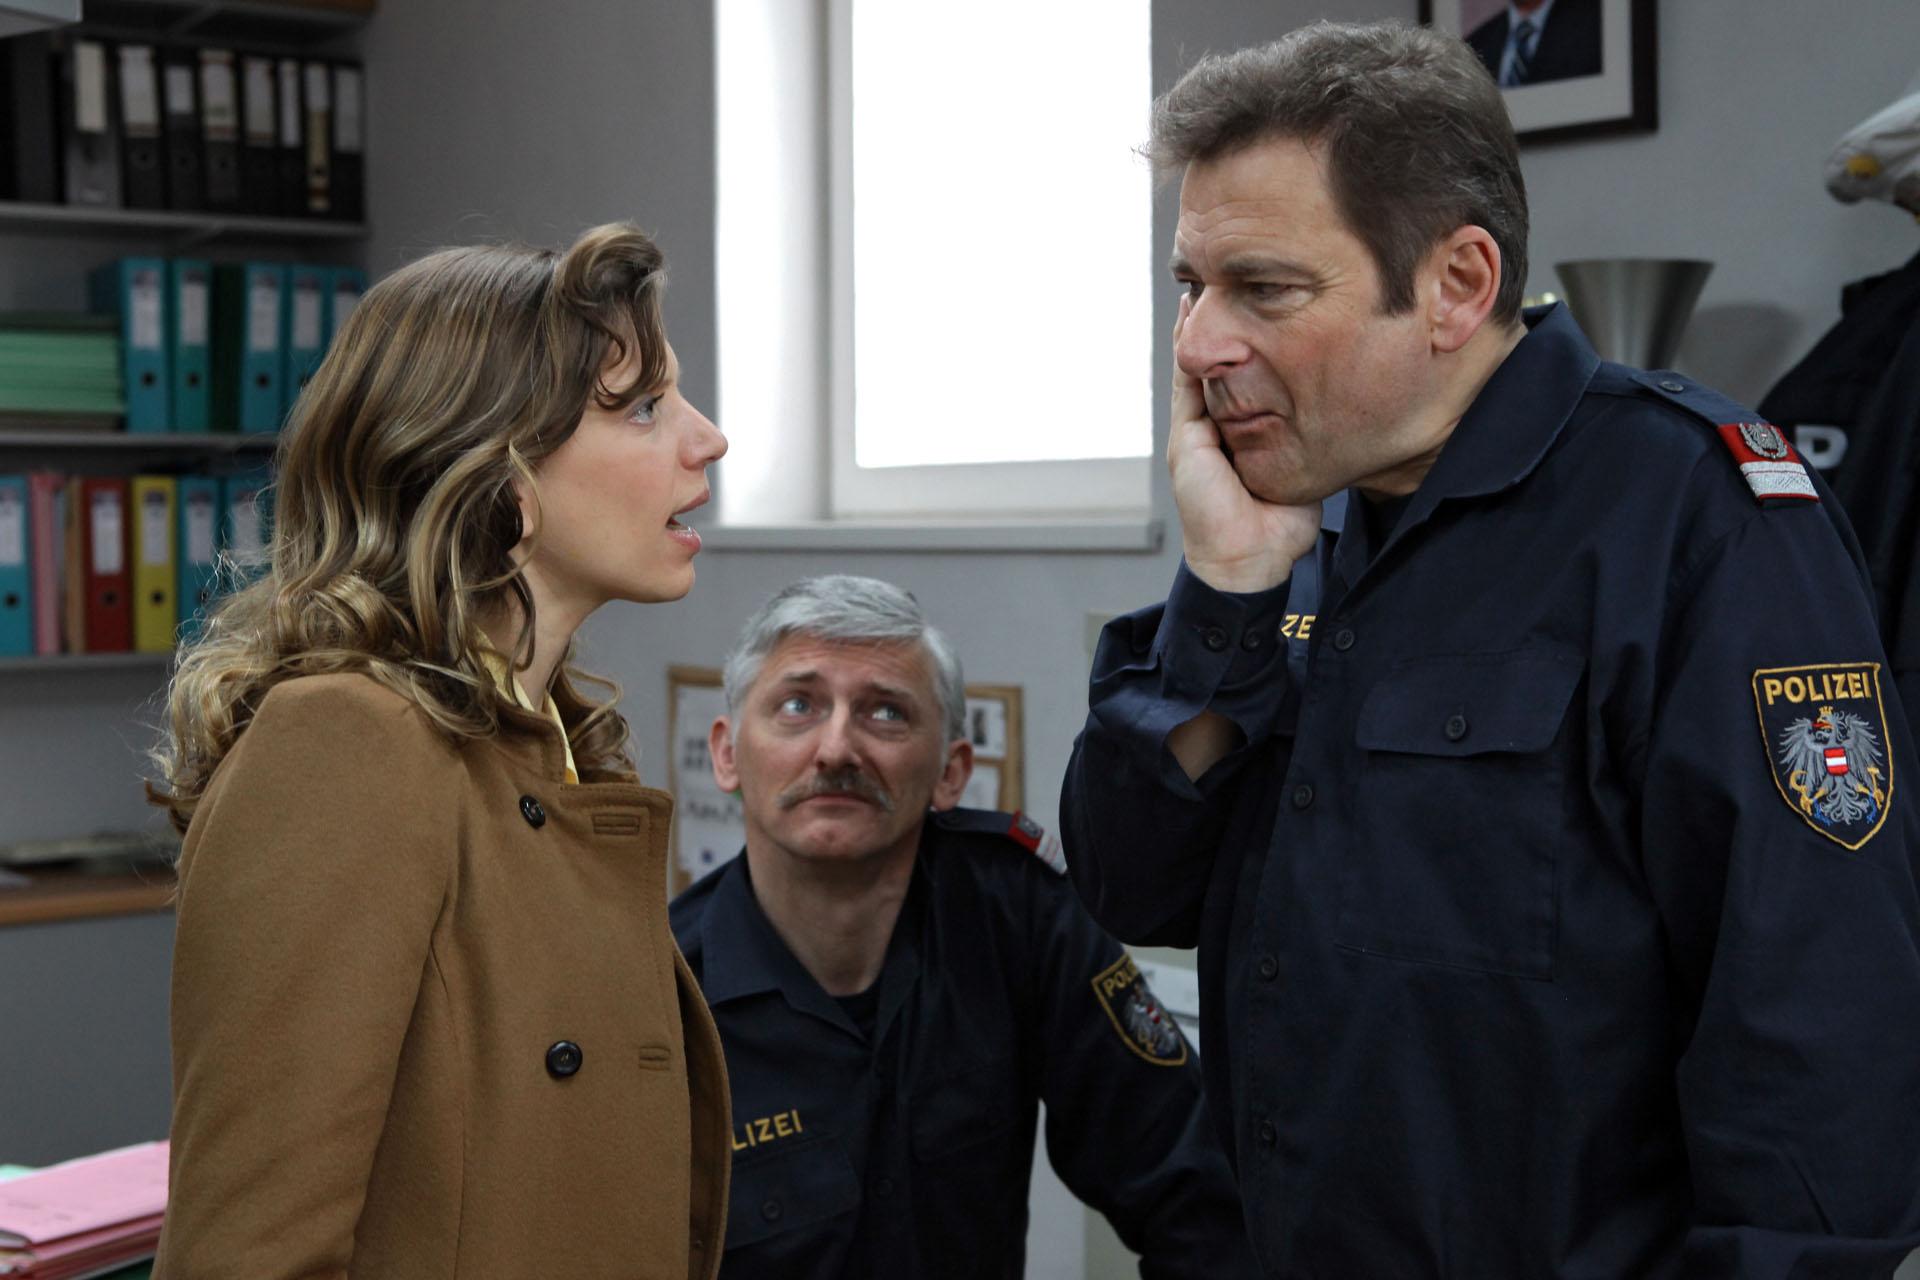 © ORF / Petro Domenigg (Star*Film) – Martina Schwab, Manfred Dungl, Andreas Steppan